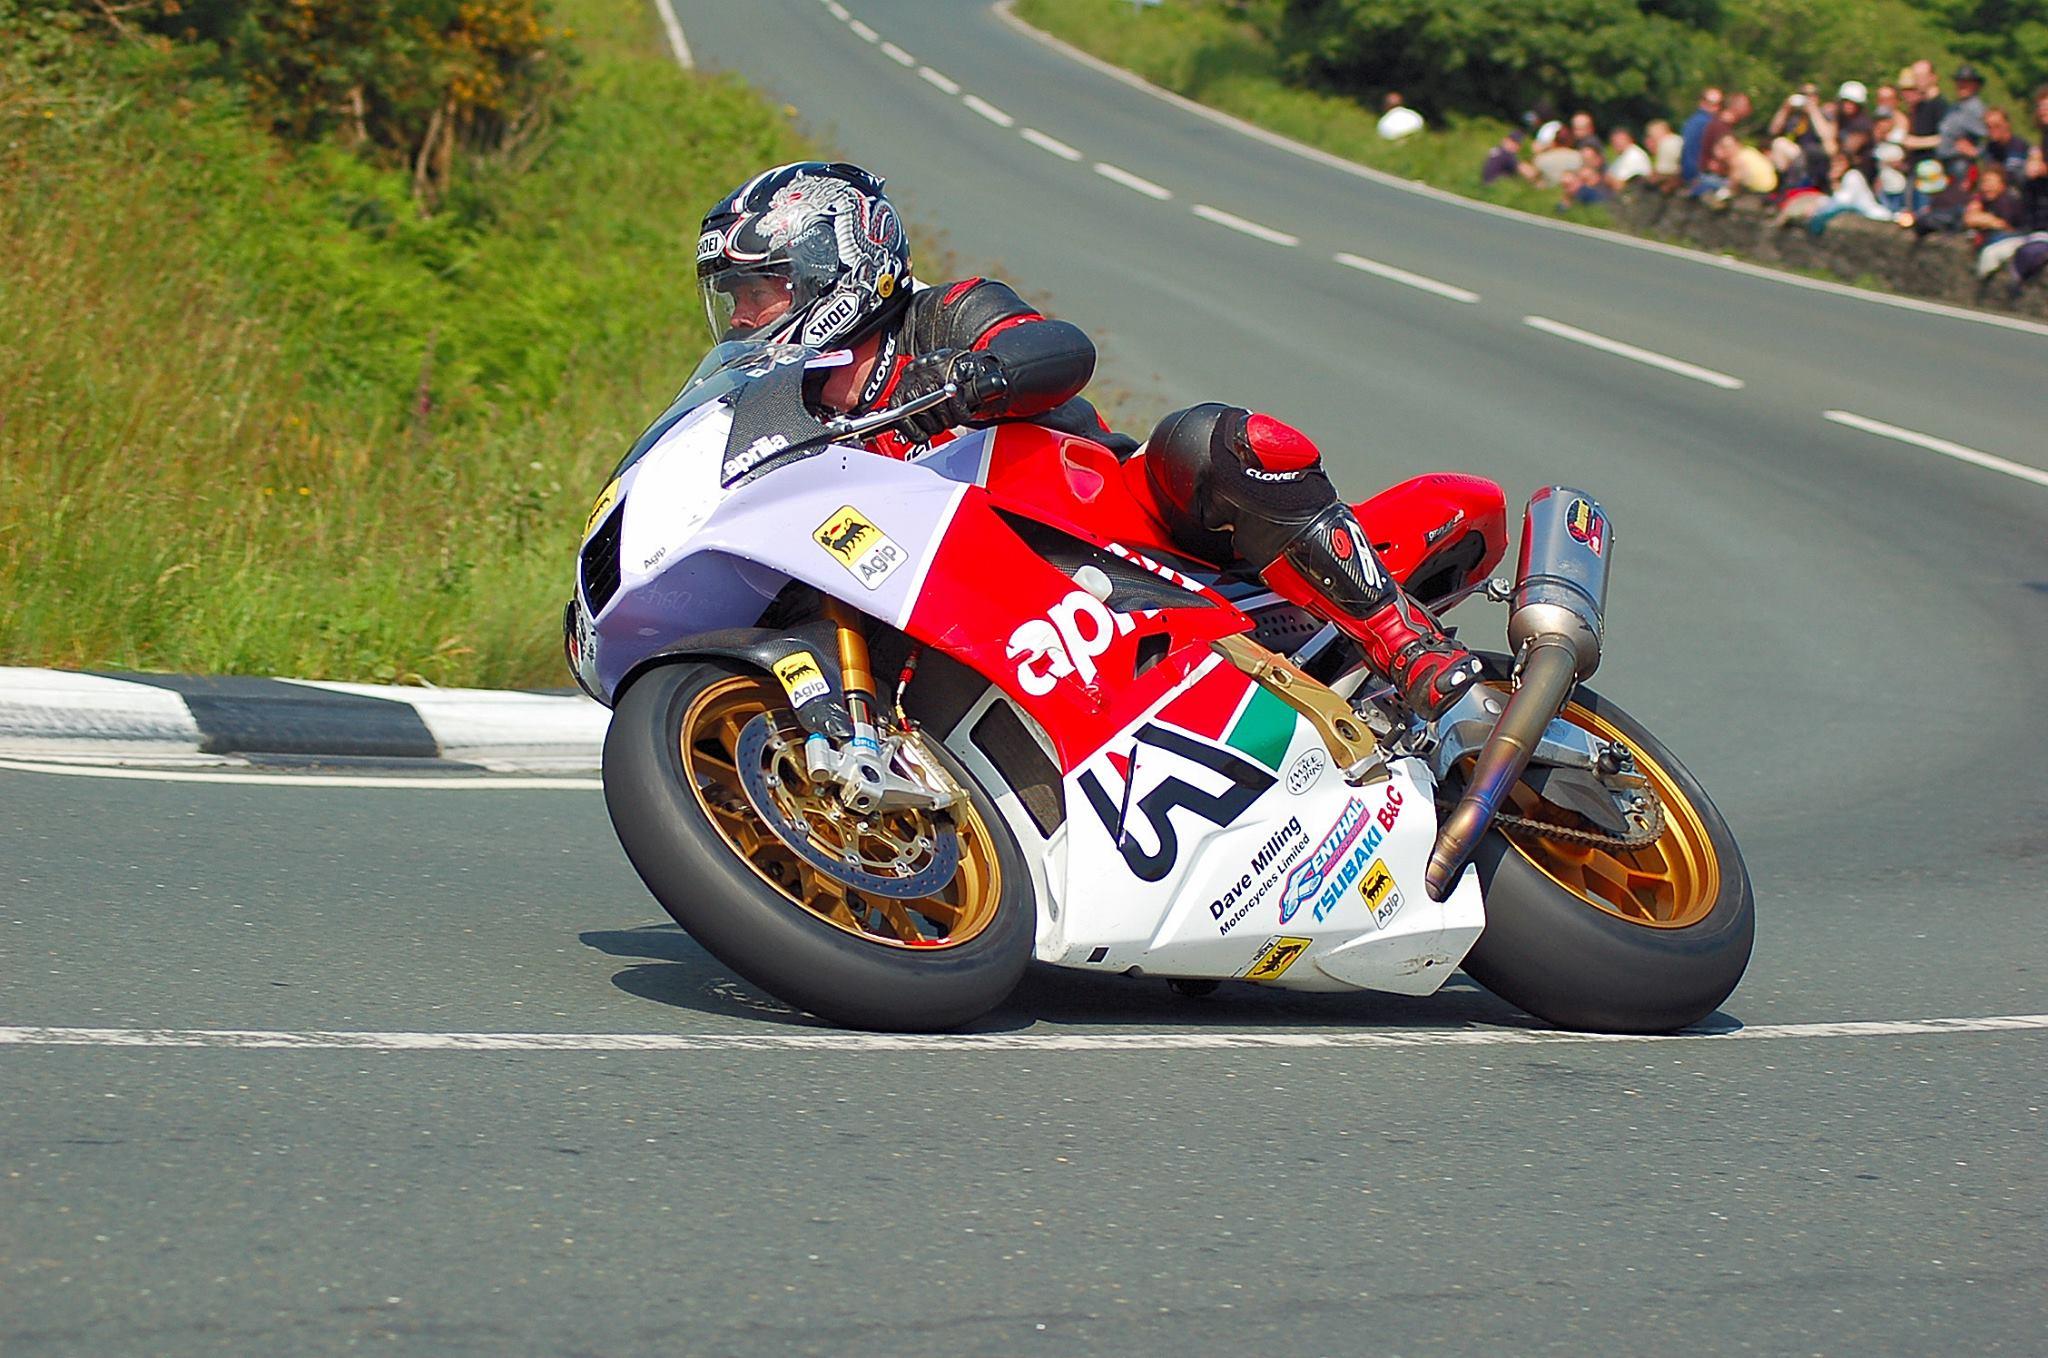 Manx GP Top 6: Dave Milling